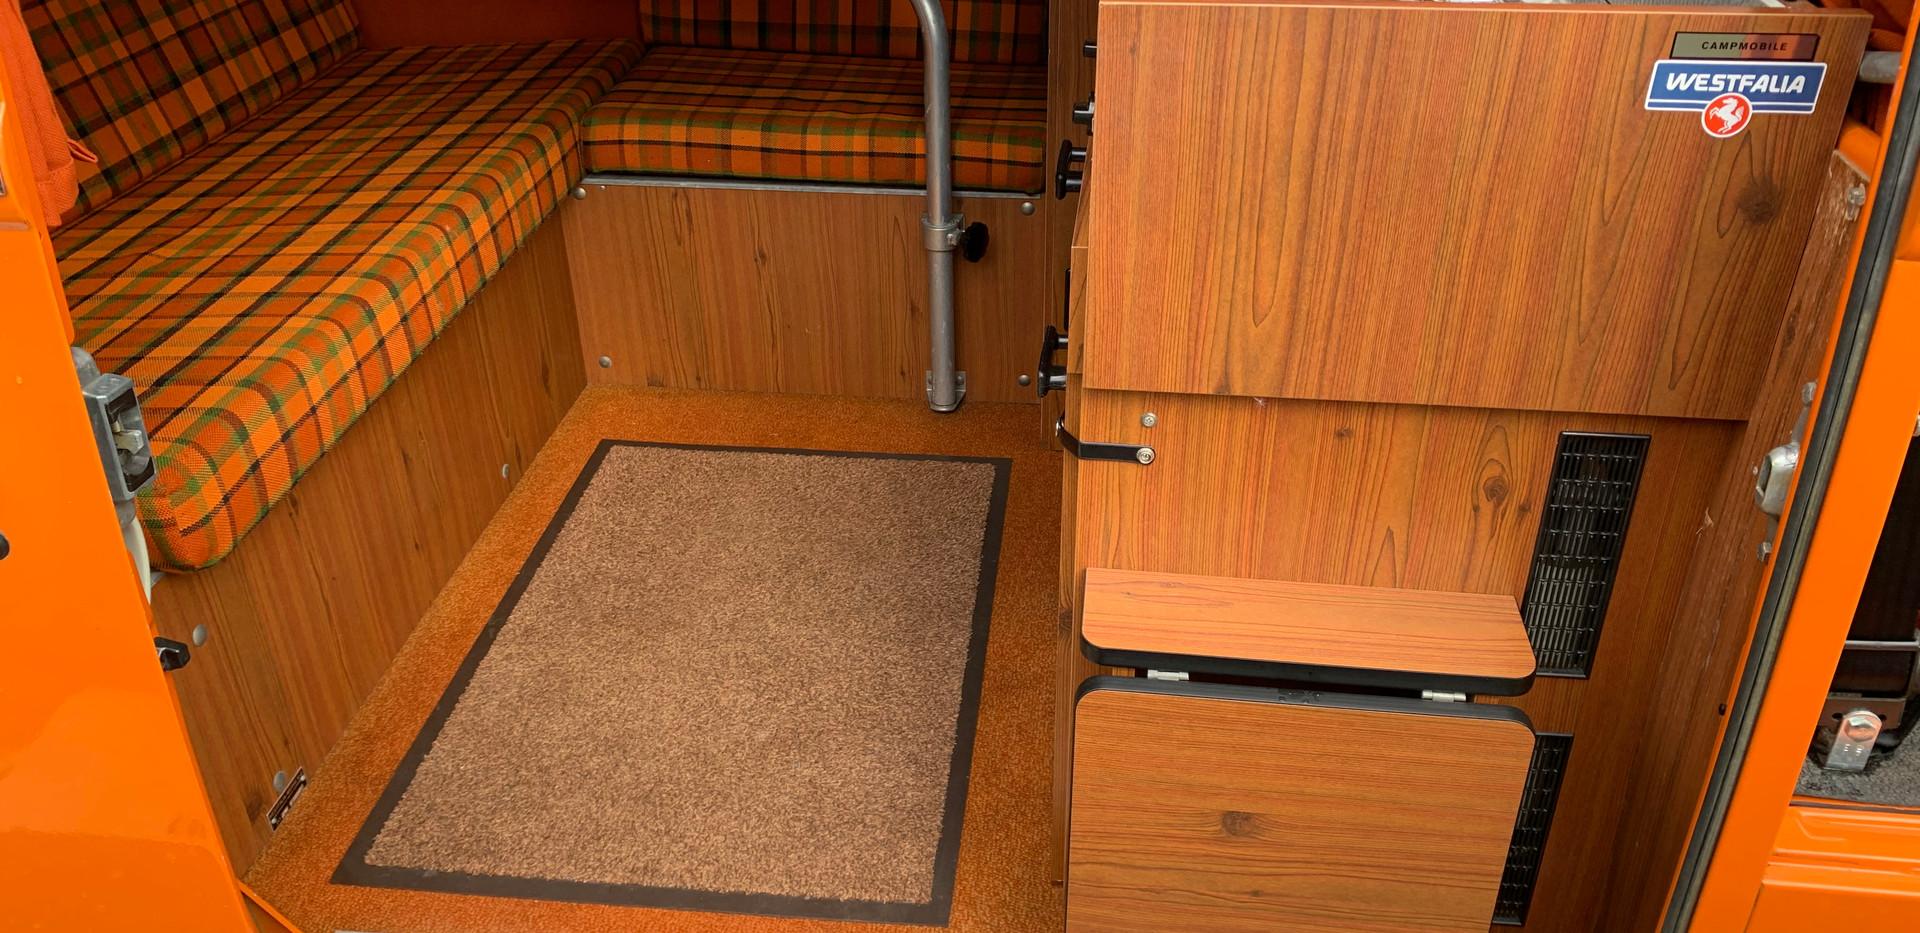 Campervan interior.jpg